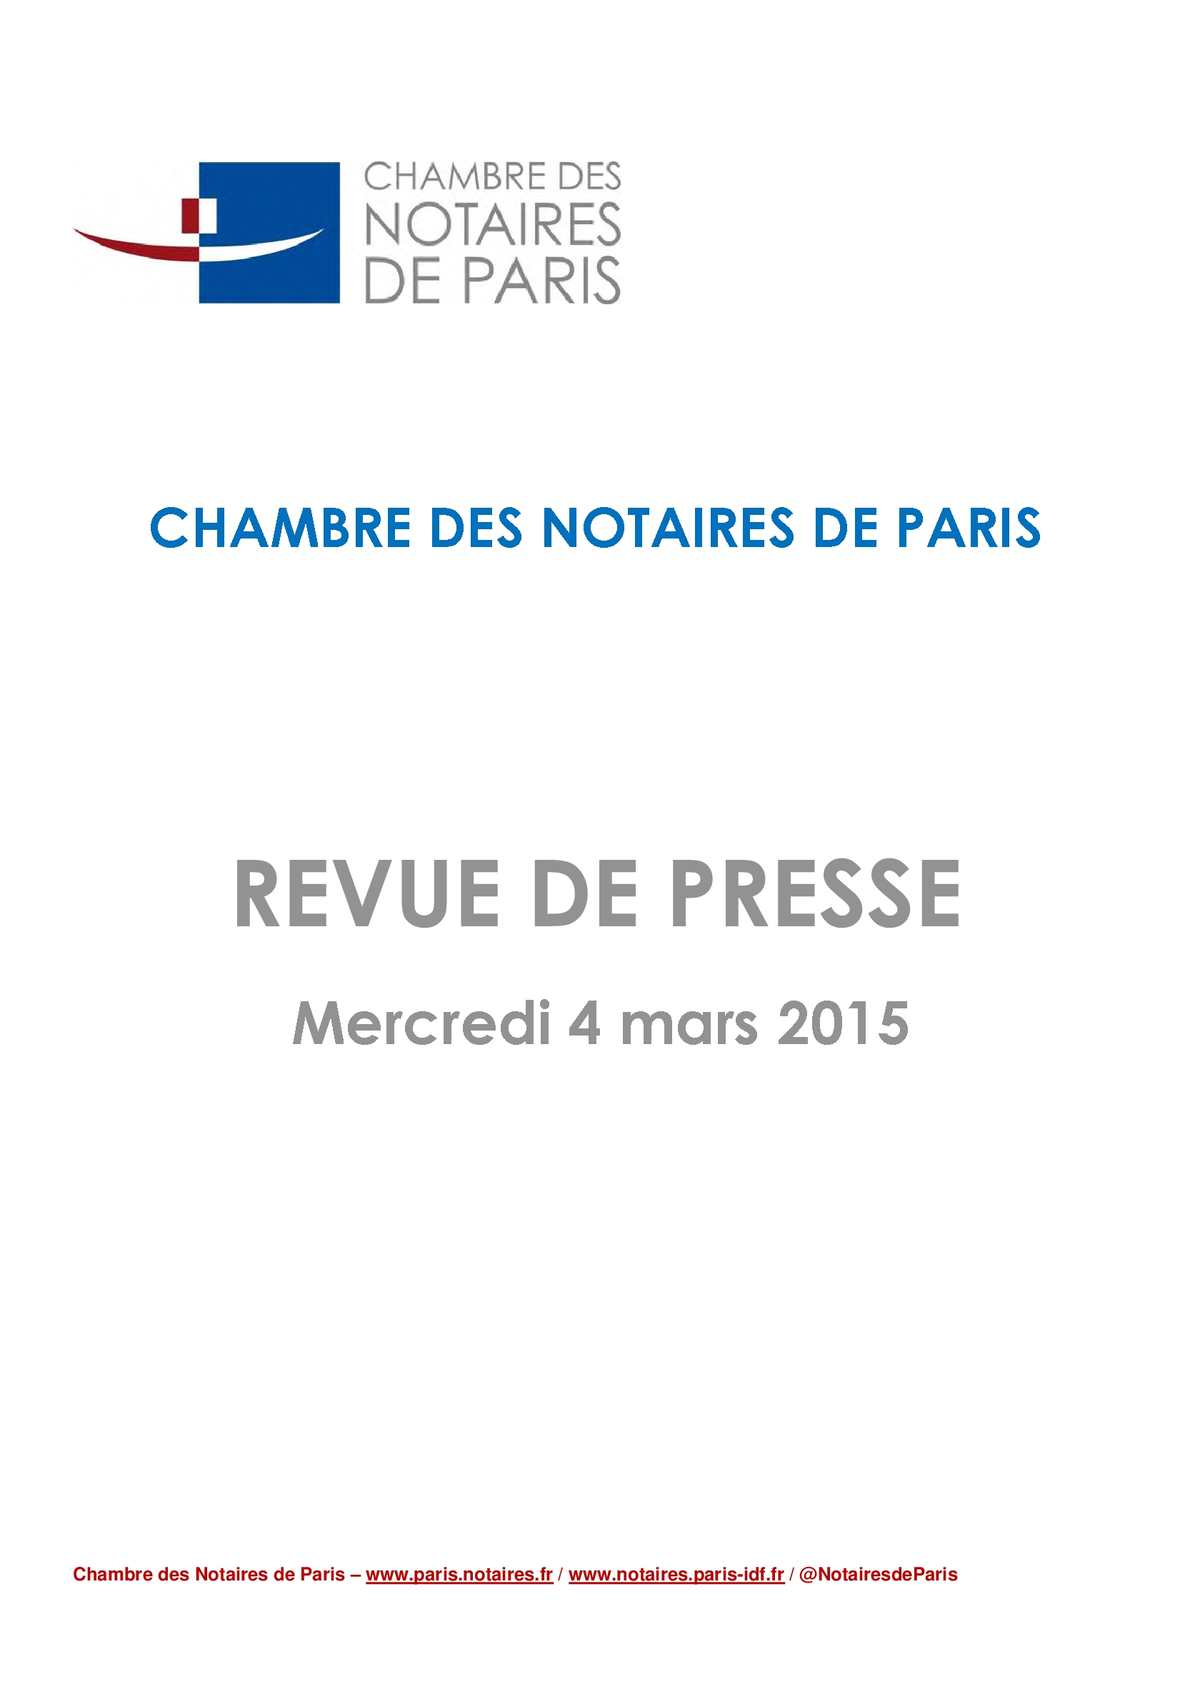 Calam o revue de presse l mercredi 4 mars 2015 for Chambre de notaire paris